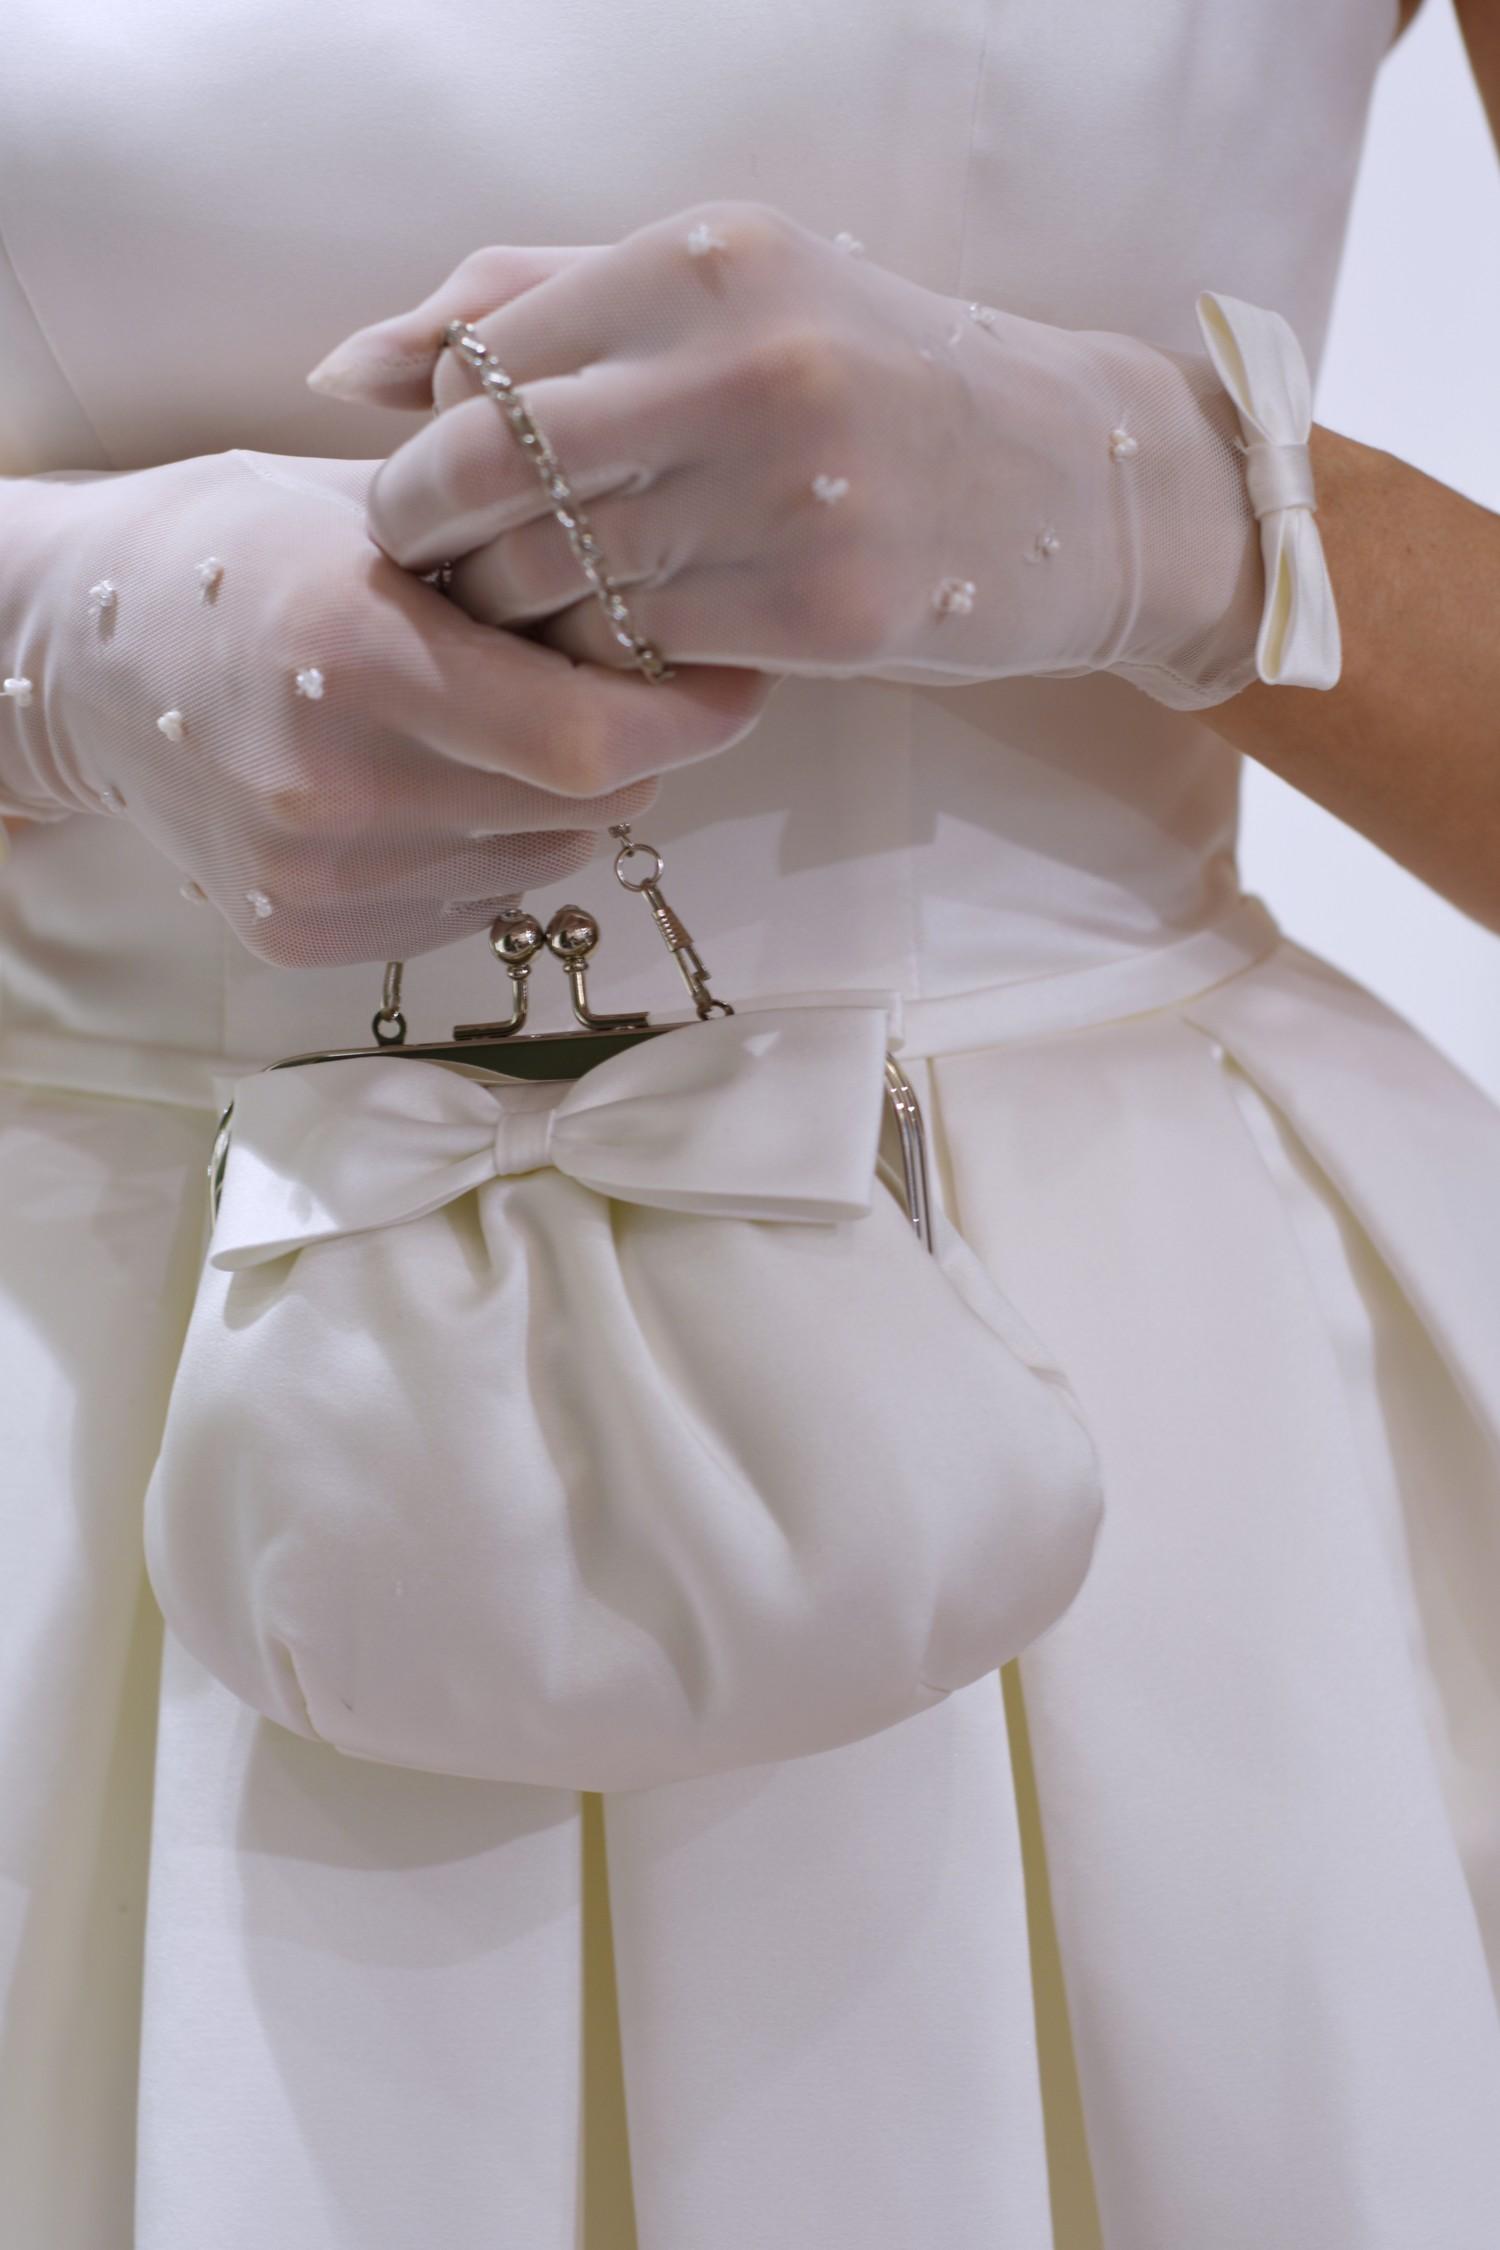 lilly-brudekjoler-annemette-voss-47